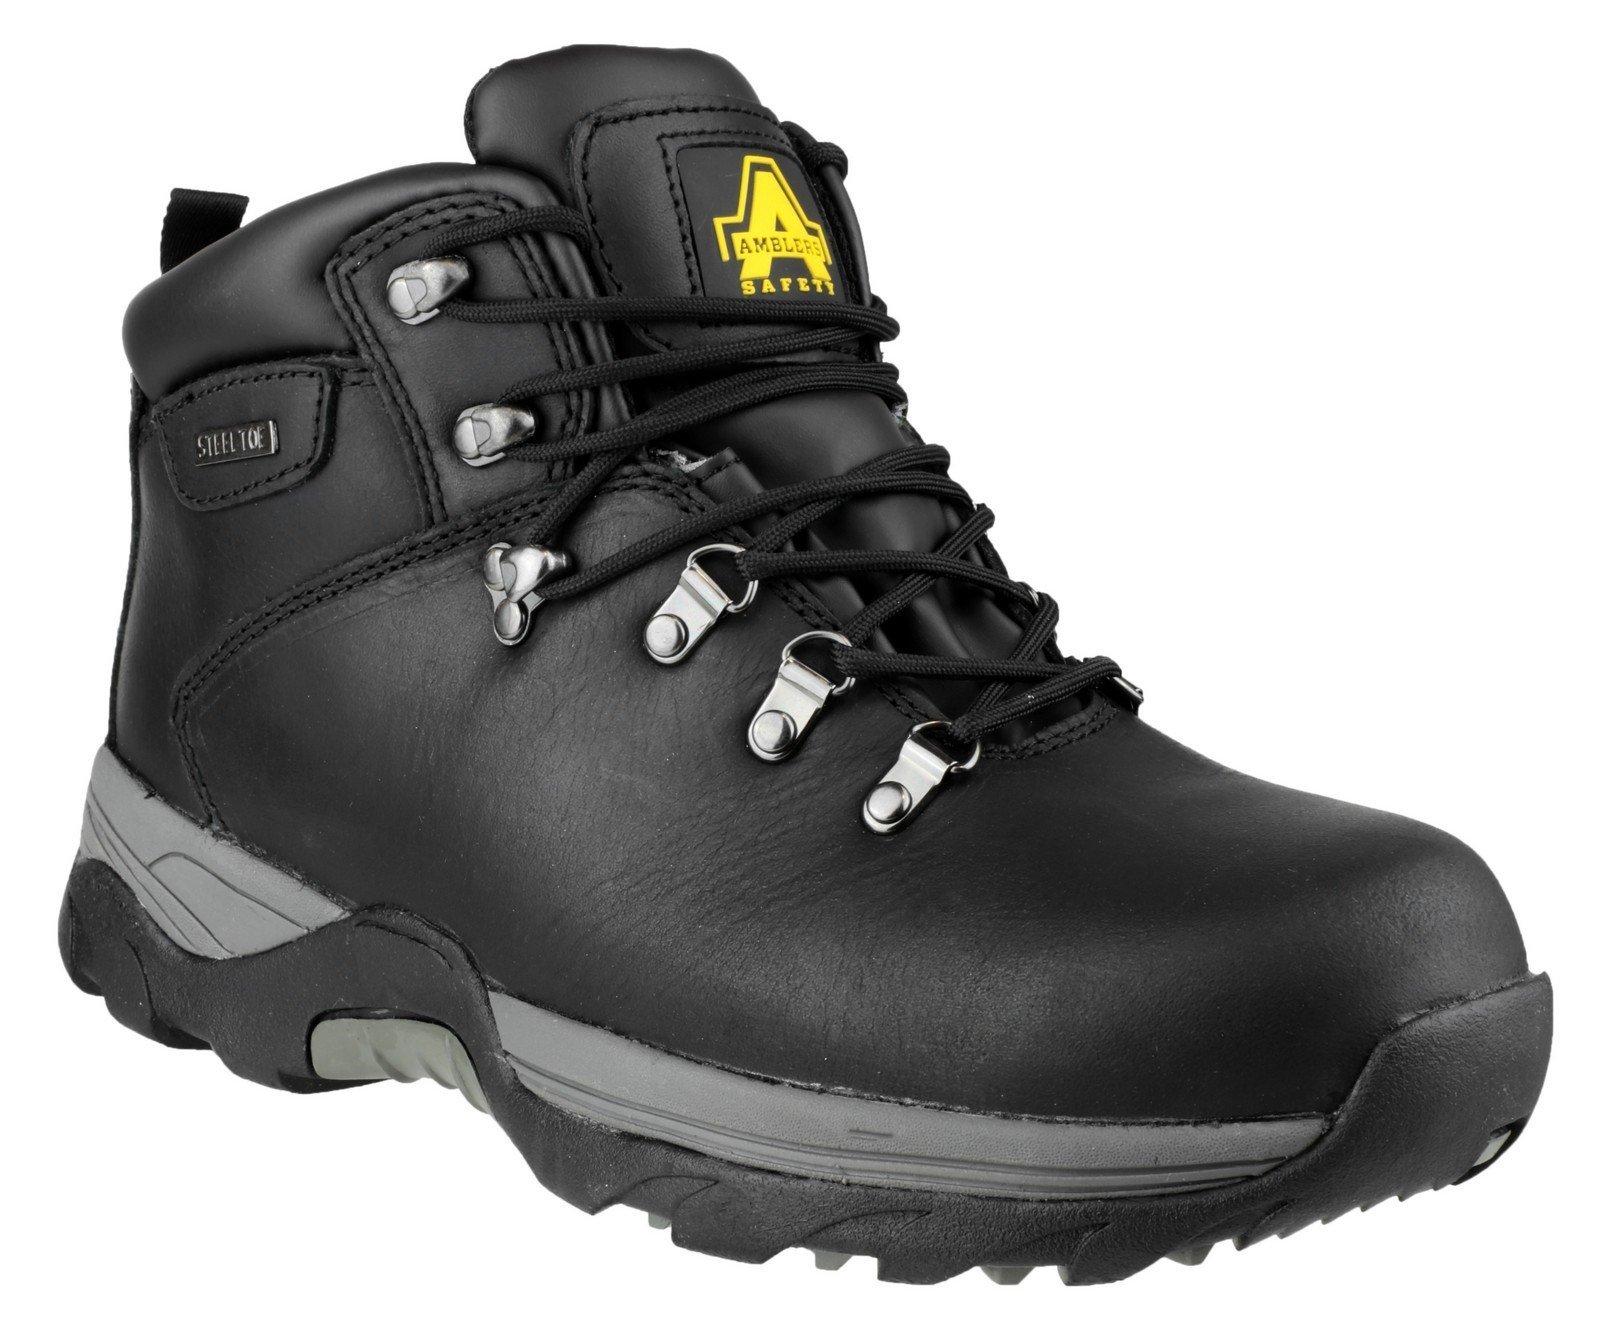 Amblers Unisex Safety Waterproof Lace up Hiker Boot Black 14103 - Black 6